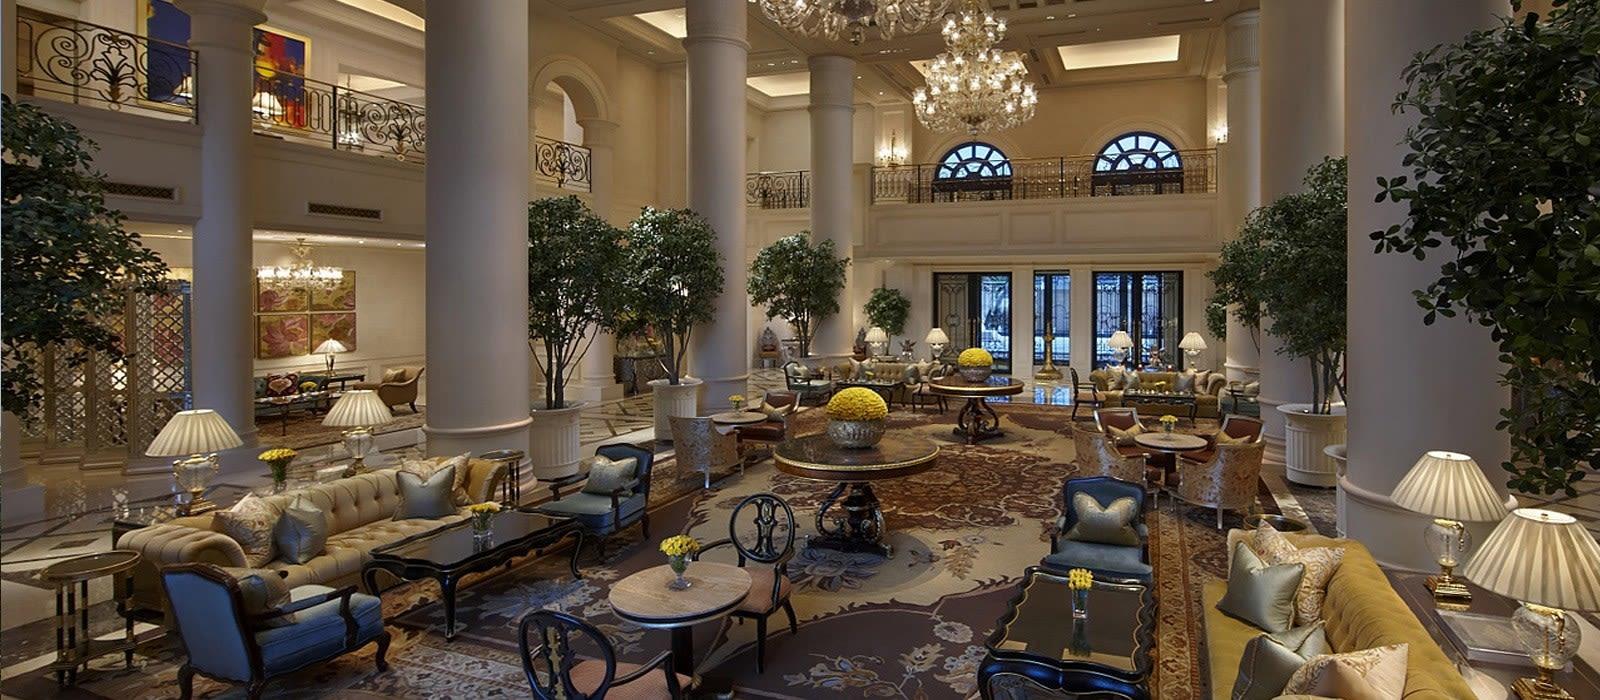 Hotel Leela Palace New Delhi Nordindien